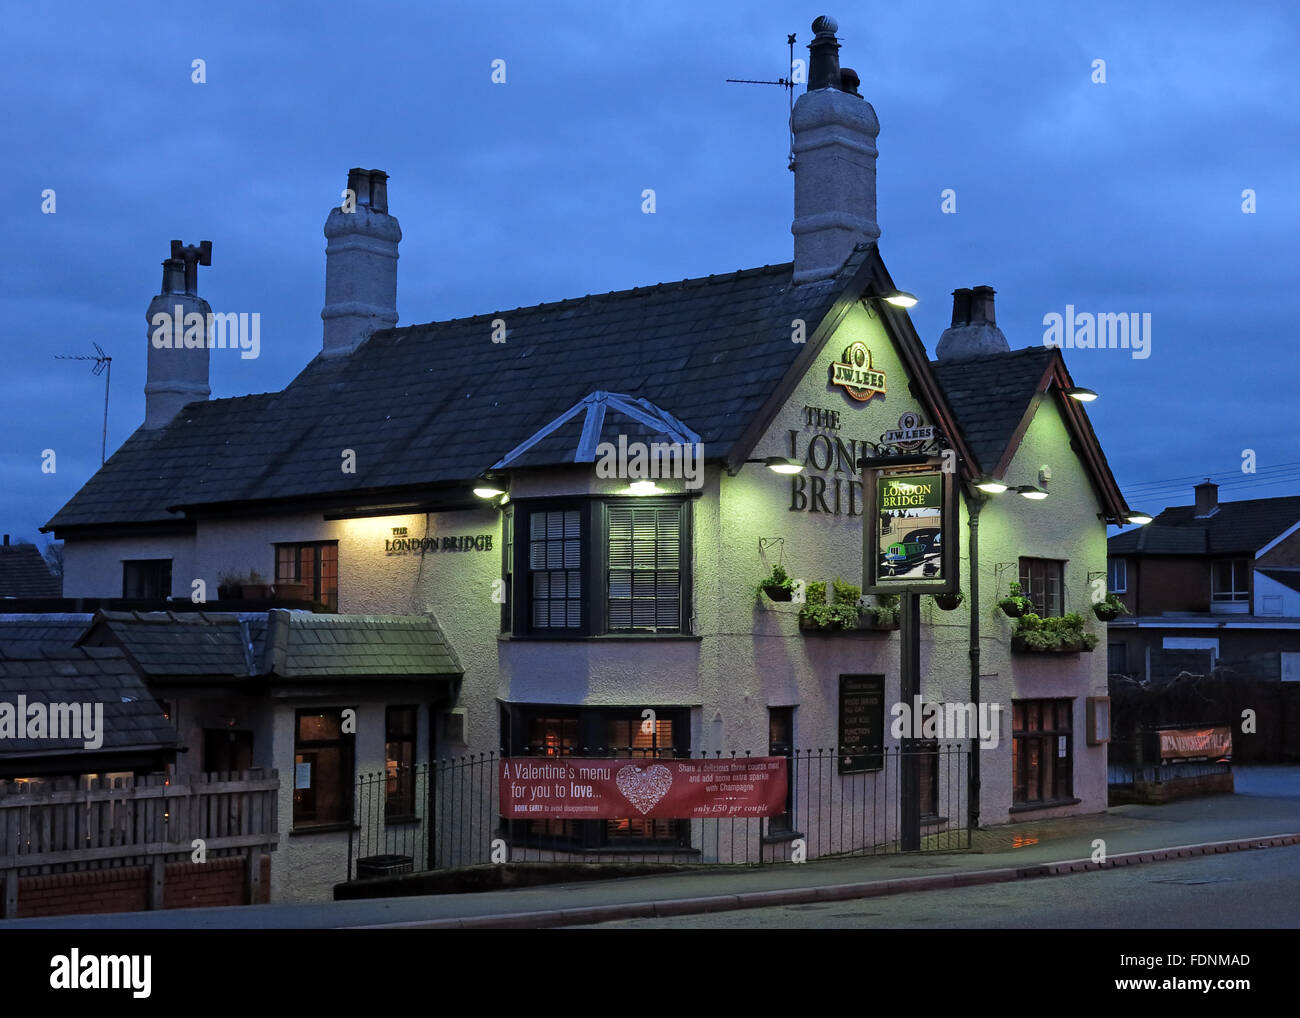 The London Bridge Pub,Stockton Heath,Warrington, At Night,Cheshire,England,UK - Stock Image